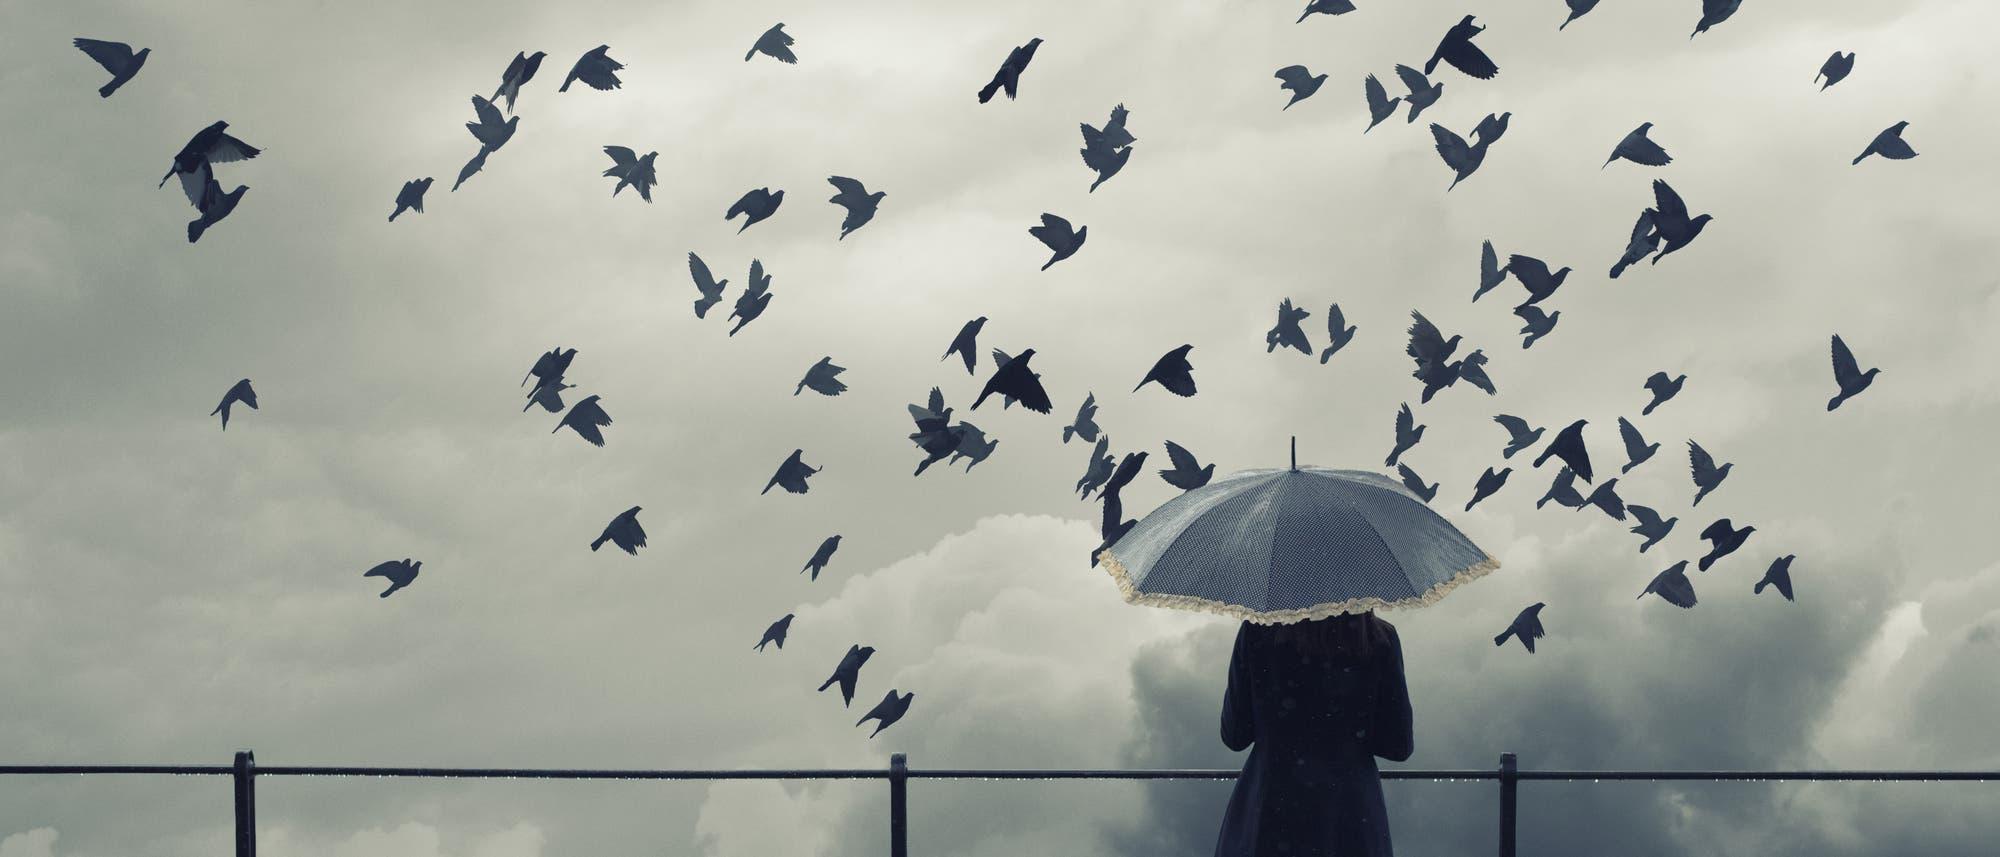 Einsame Frau beobachtet Vögel